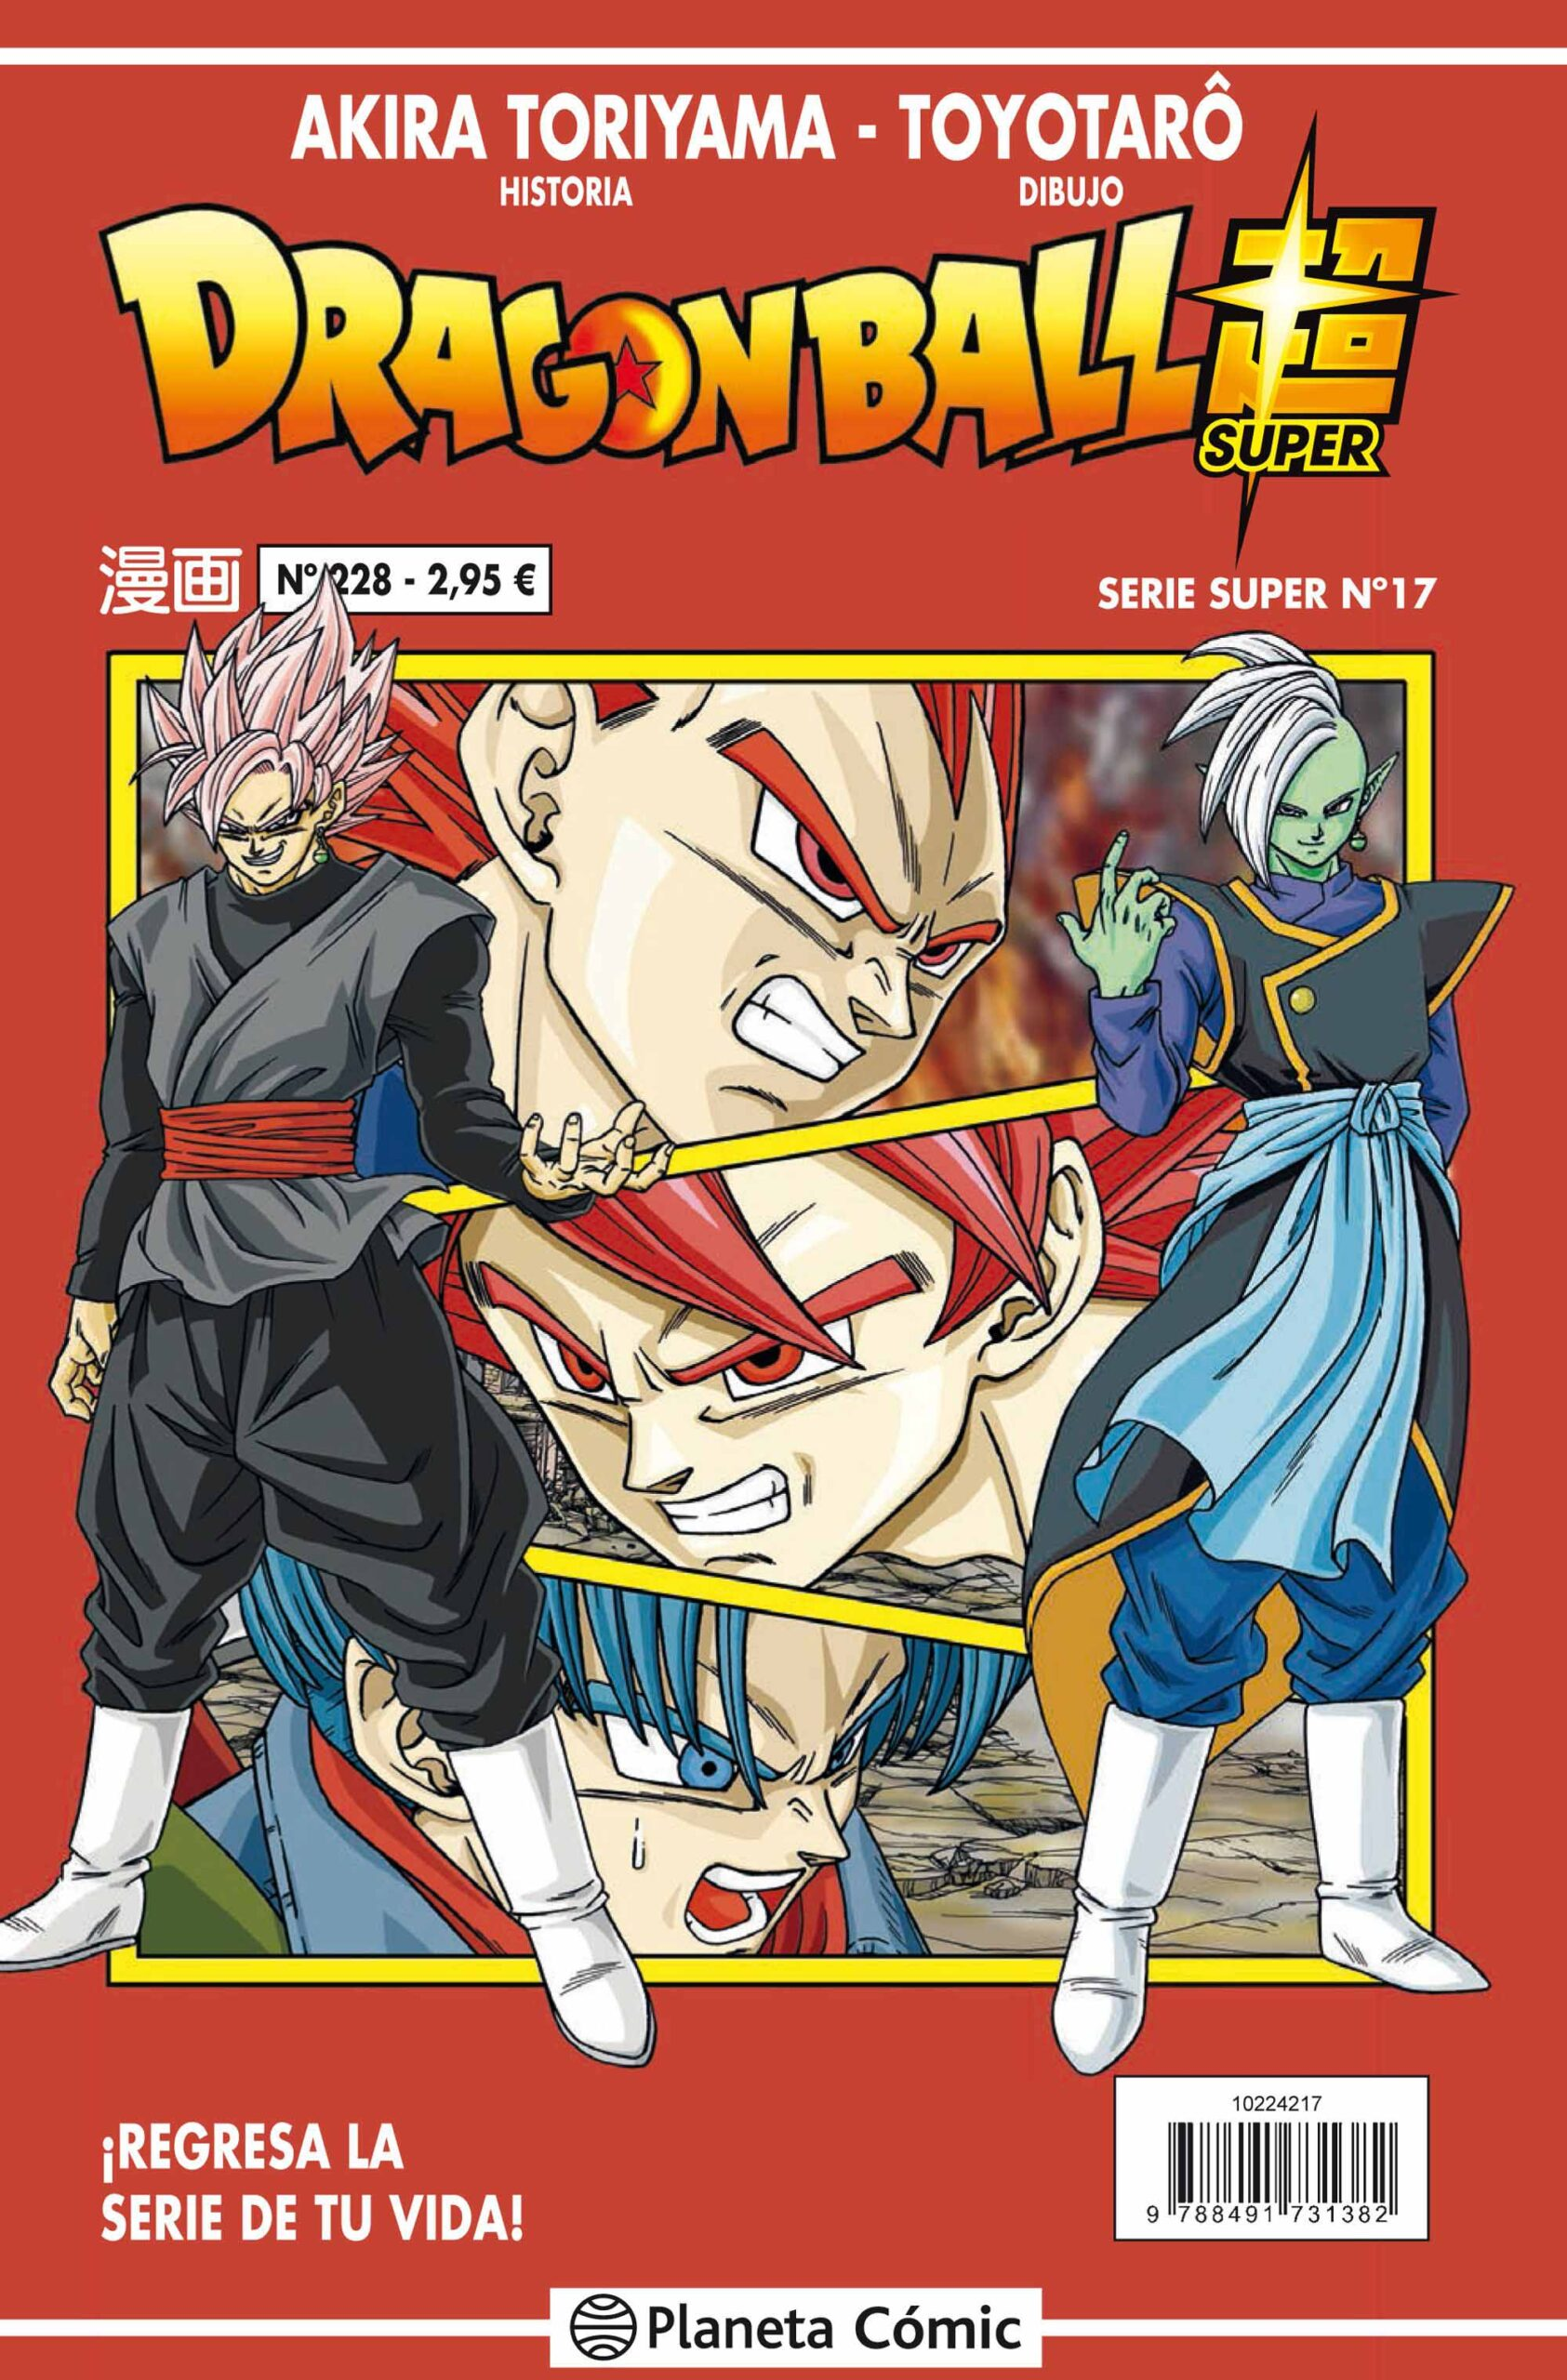 'Dragon Ball Super' 17 / 228 Serie Roja. Reseña del manga